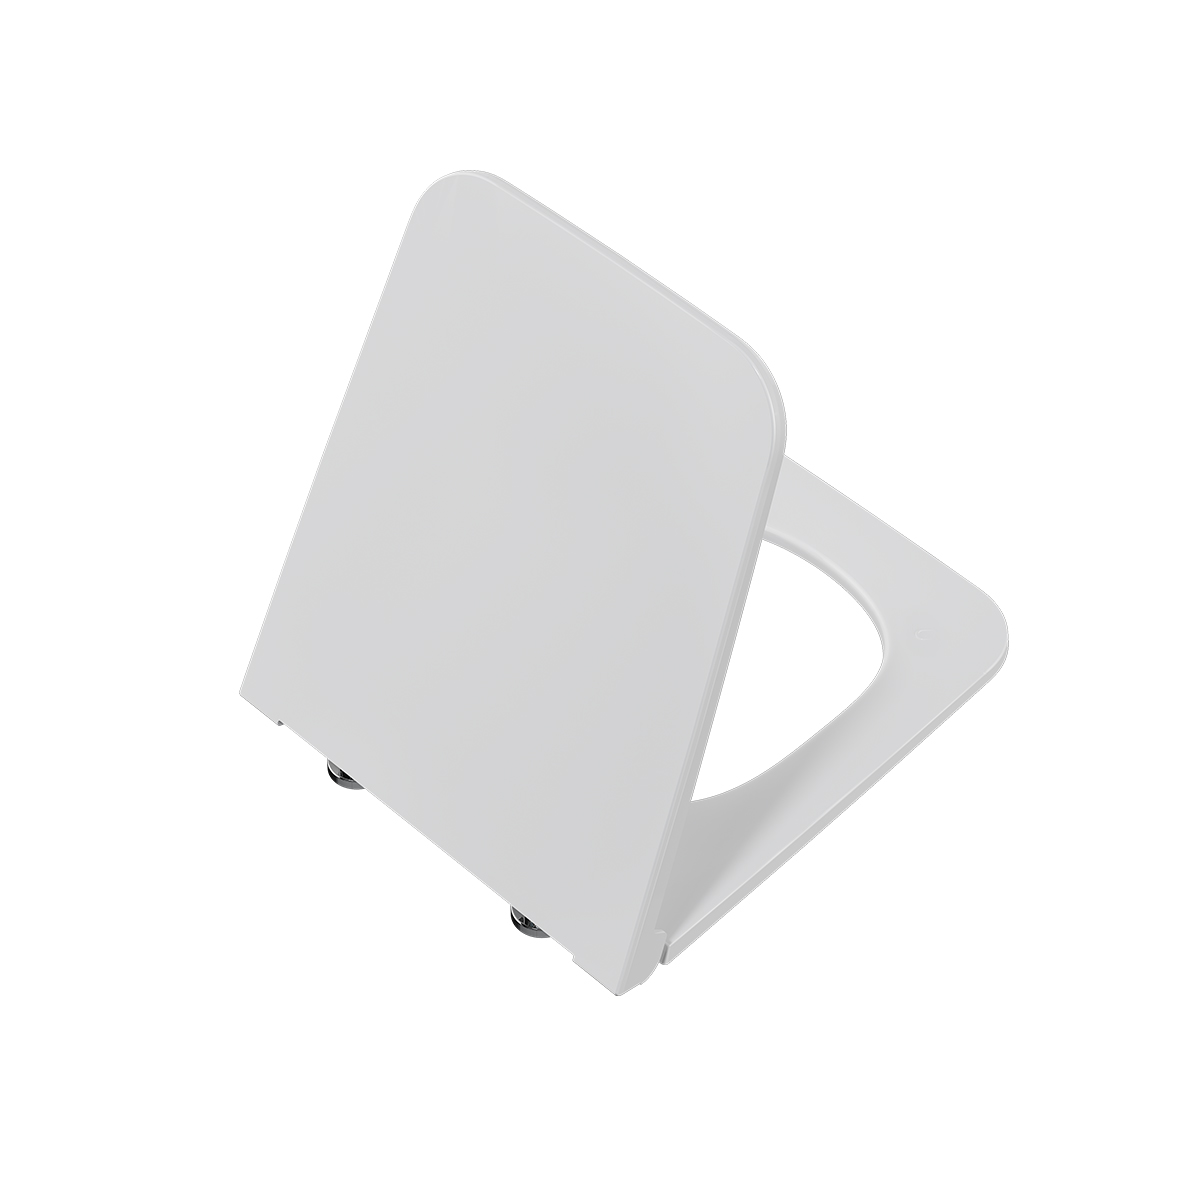 Equal WC-Sitz Slim ohne Absenkautomatik, Weiß Hochglanz